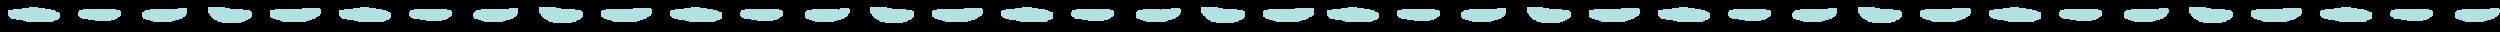 Mint dash photo branding page separator